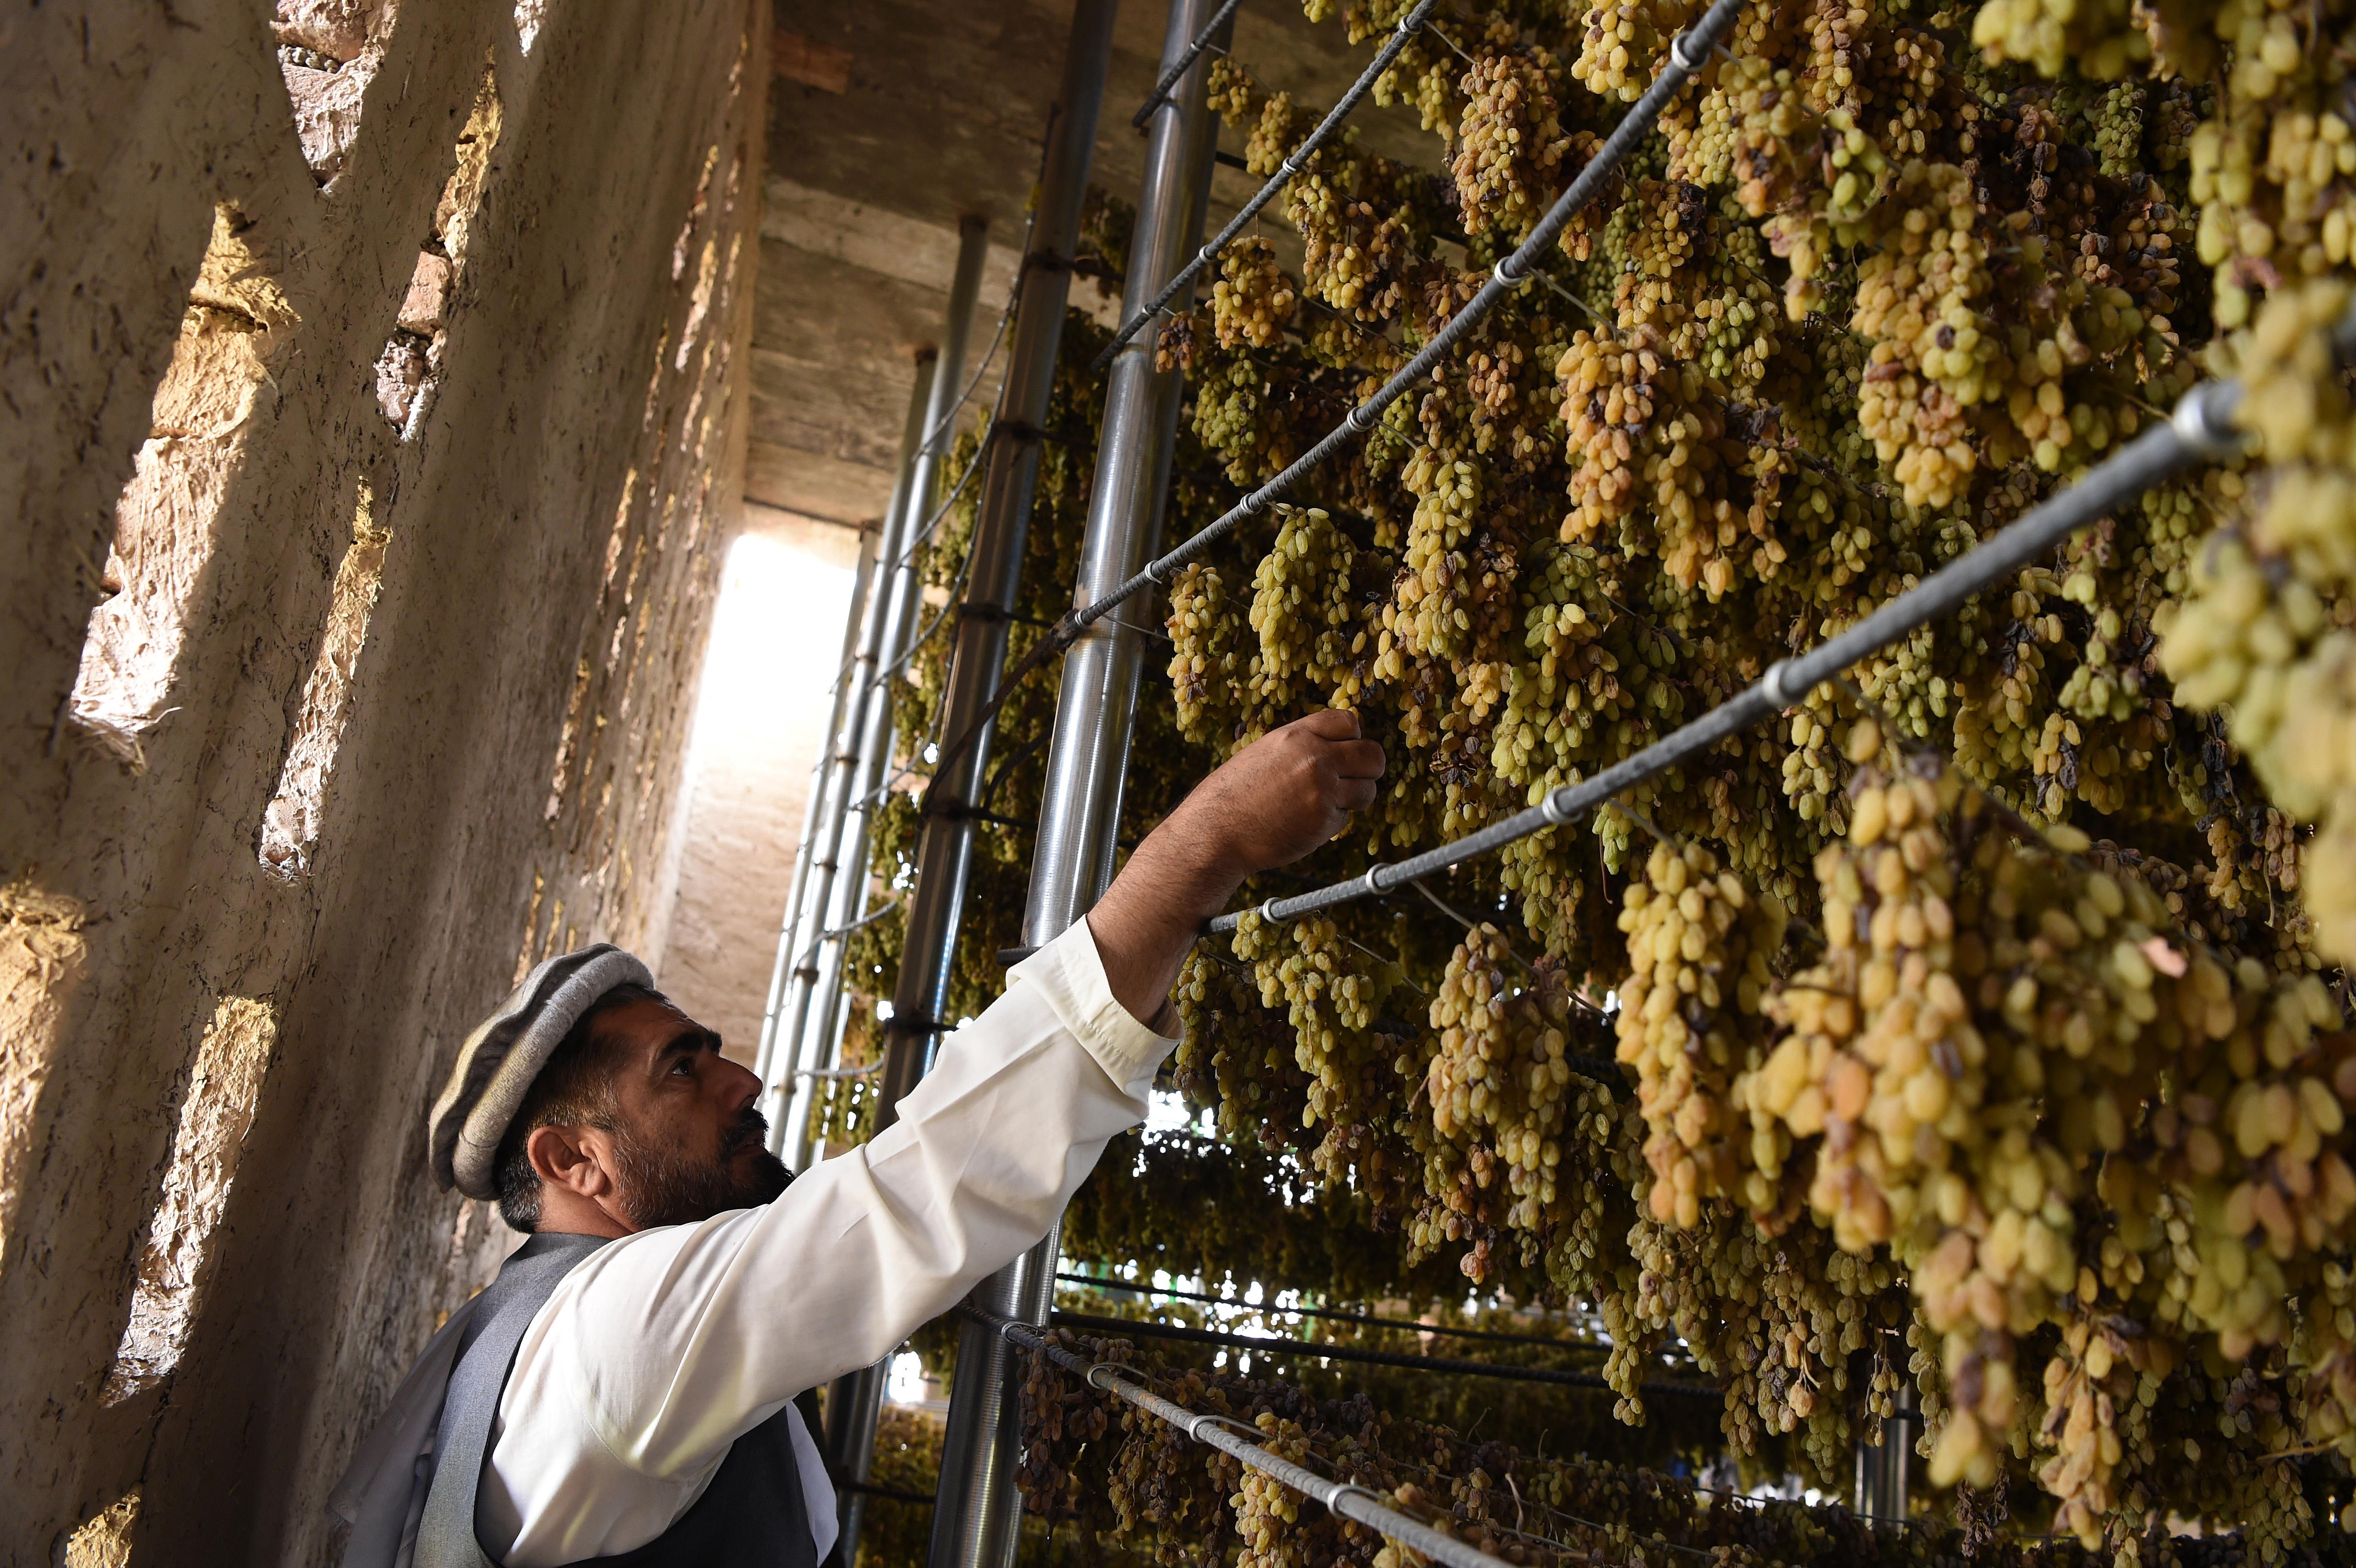 Afghanistan revamps traditional raisin houses